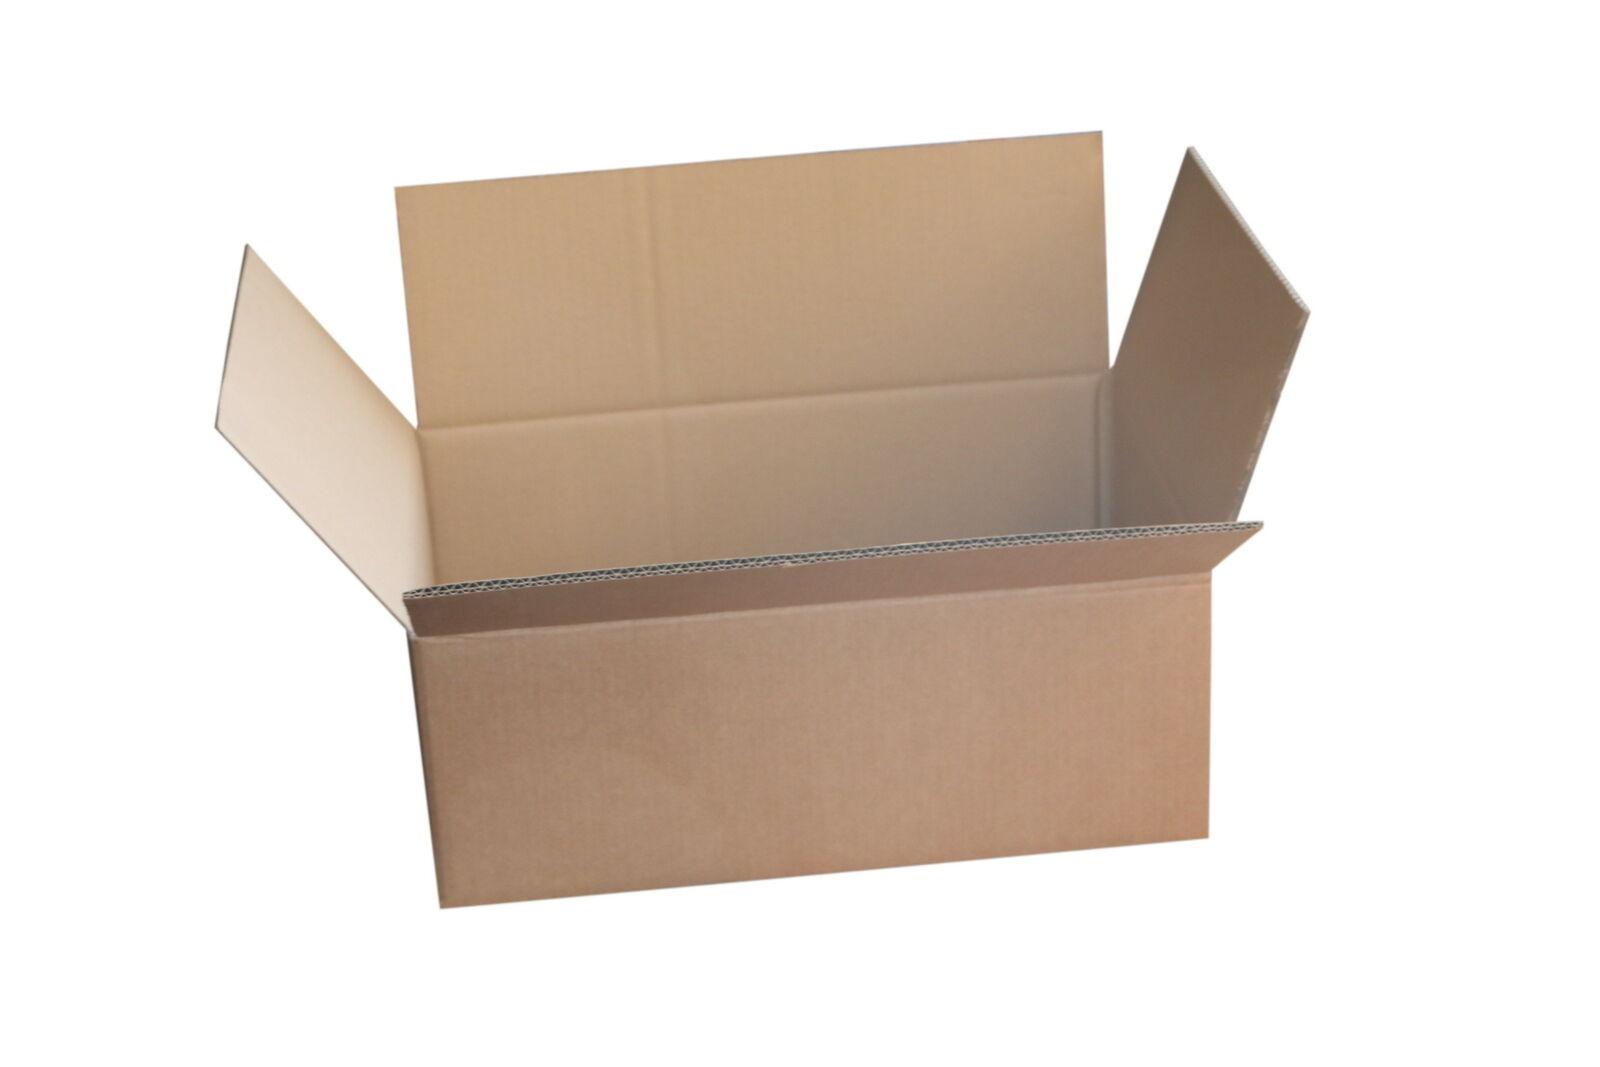 Kartons für Bücher oder Umzug – 10 Stück